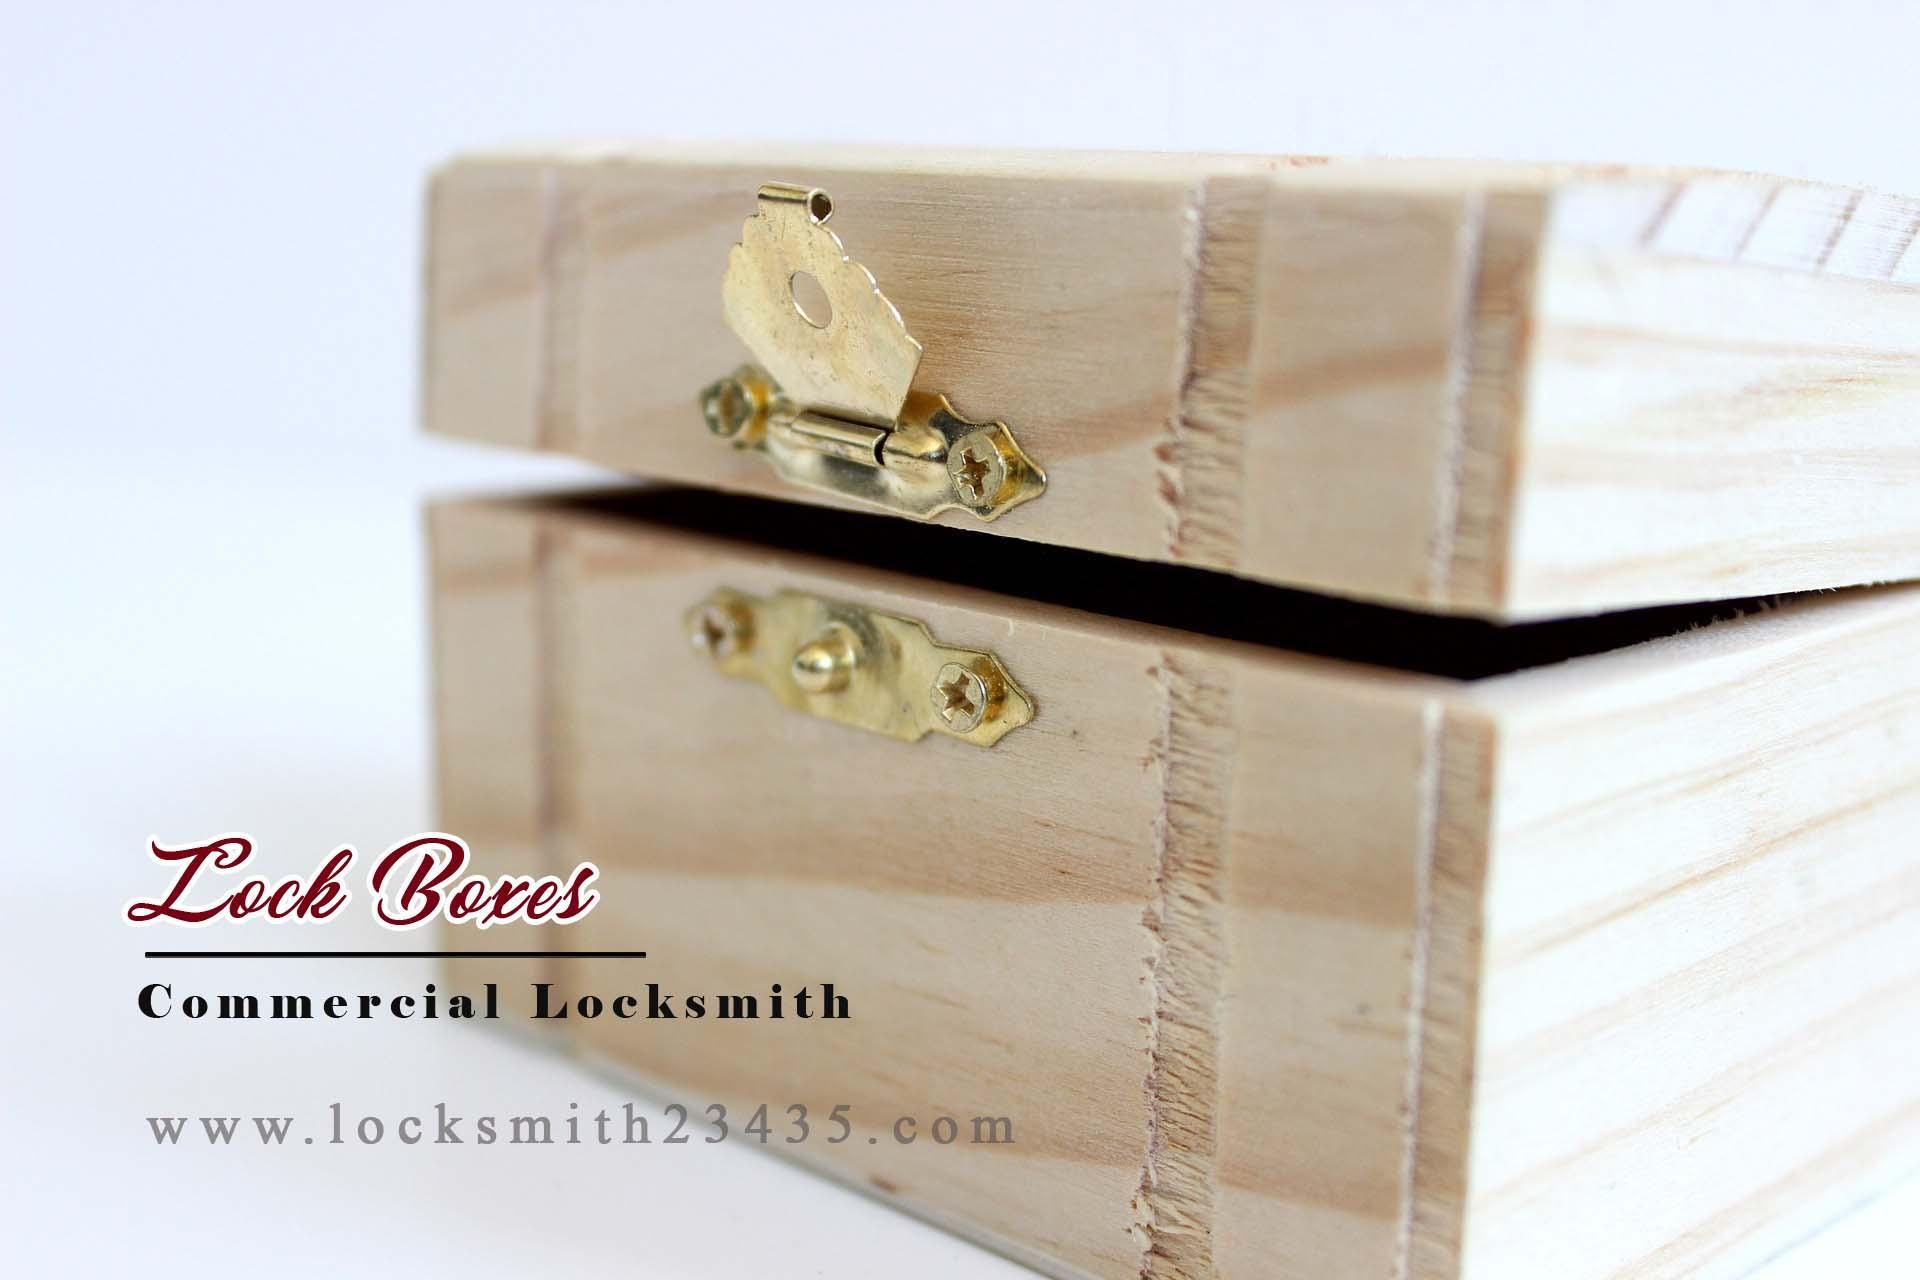 Locksmith 23435